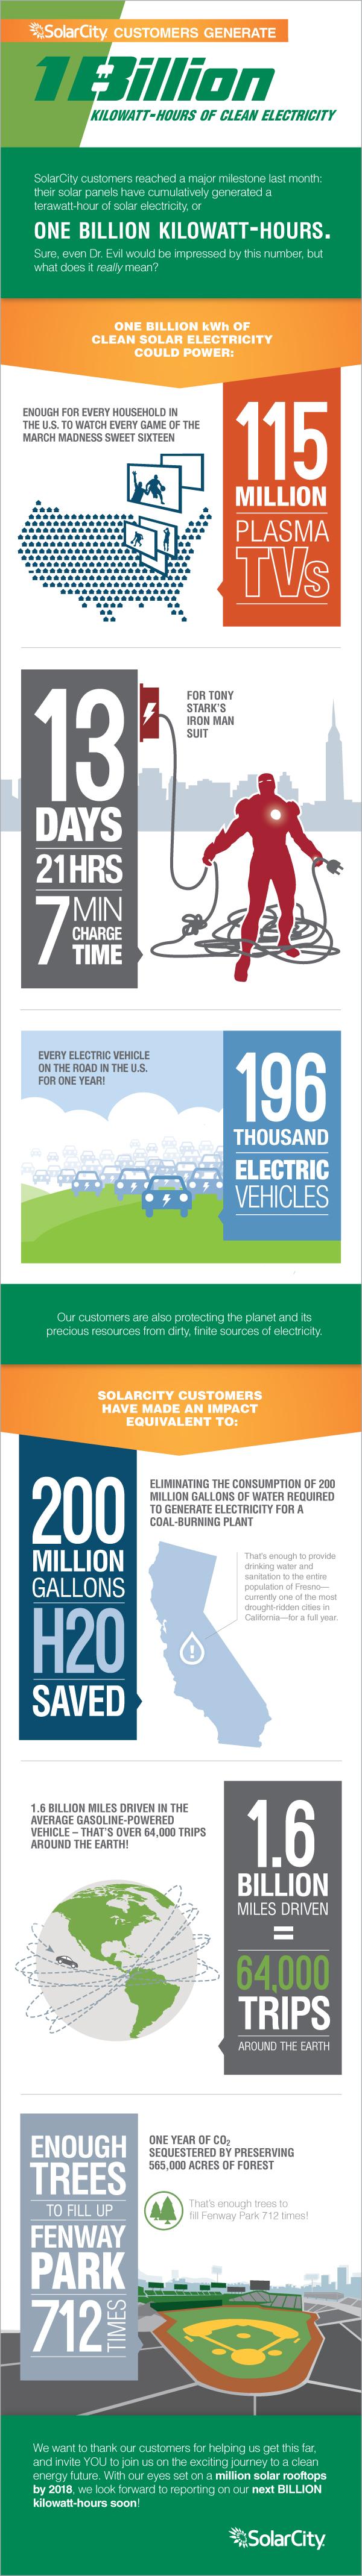 SolarCIty Infographic - One Billion Kilowatt-Hours of Solar Power Generated